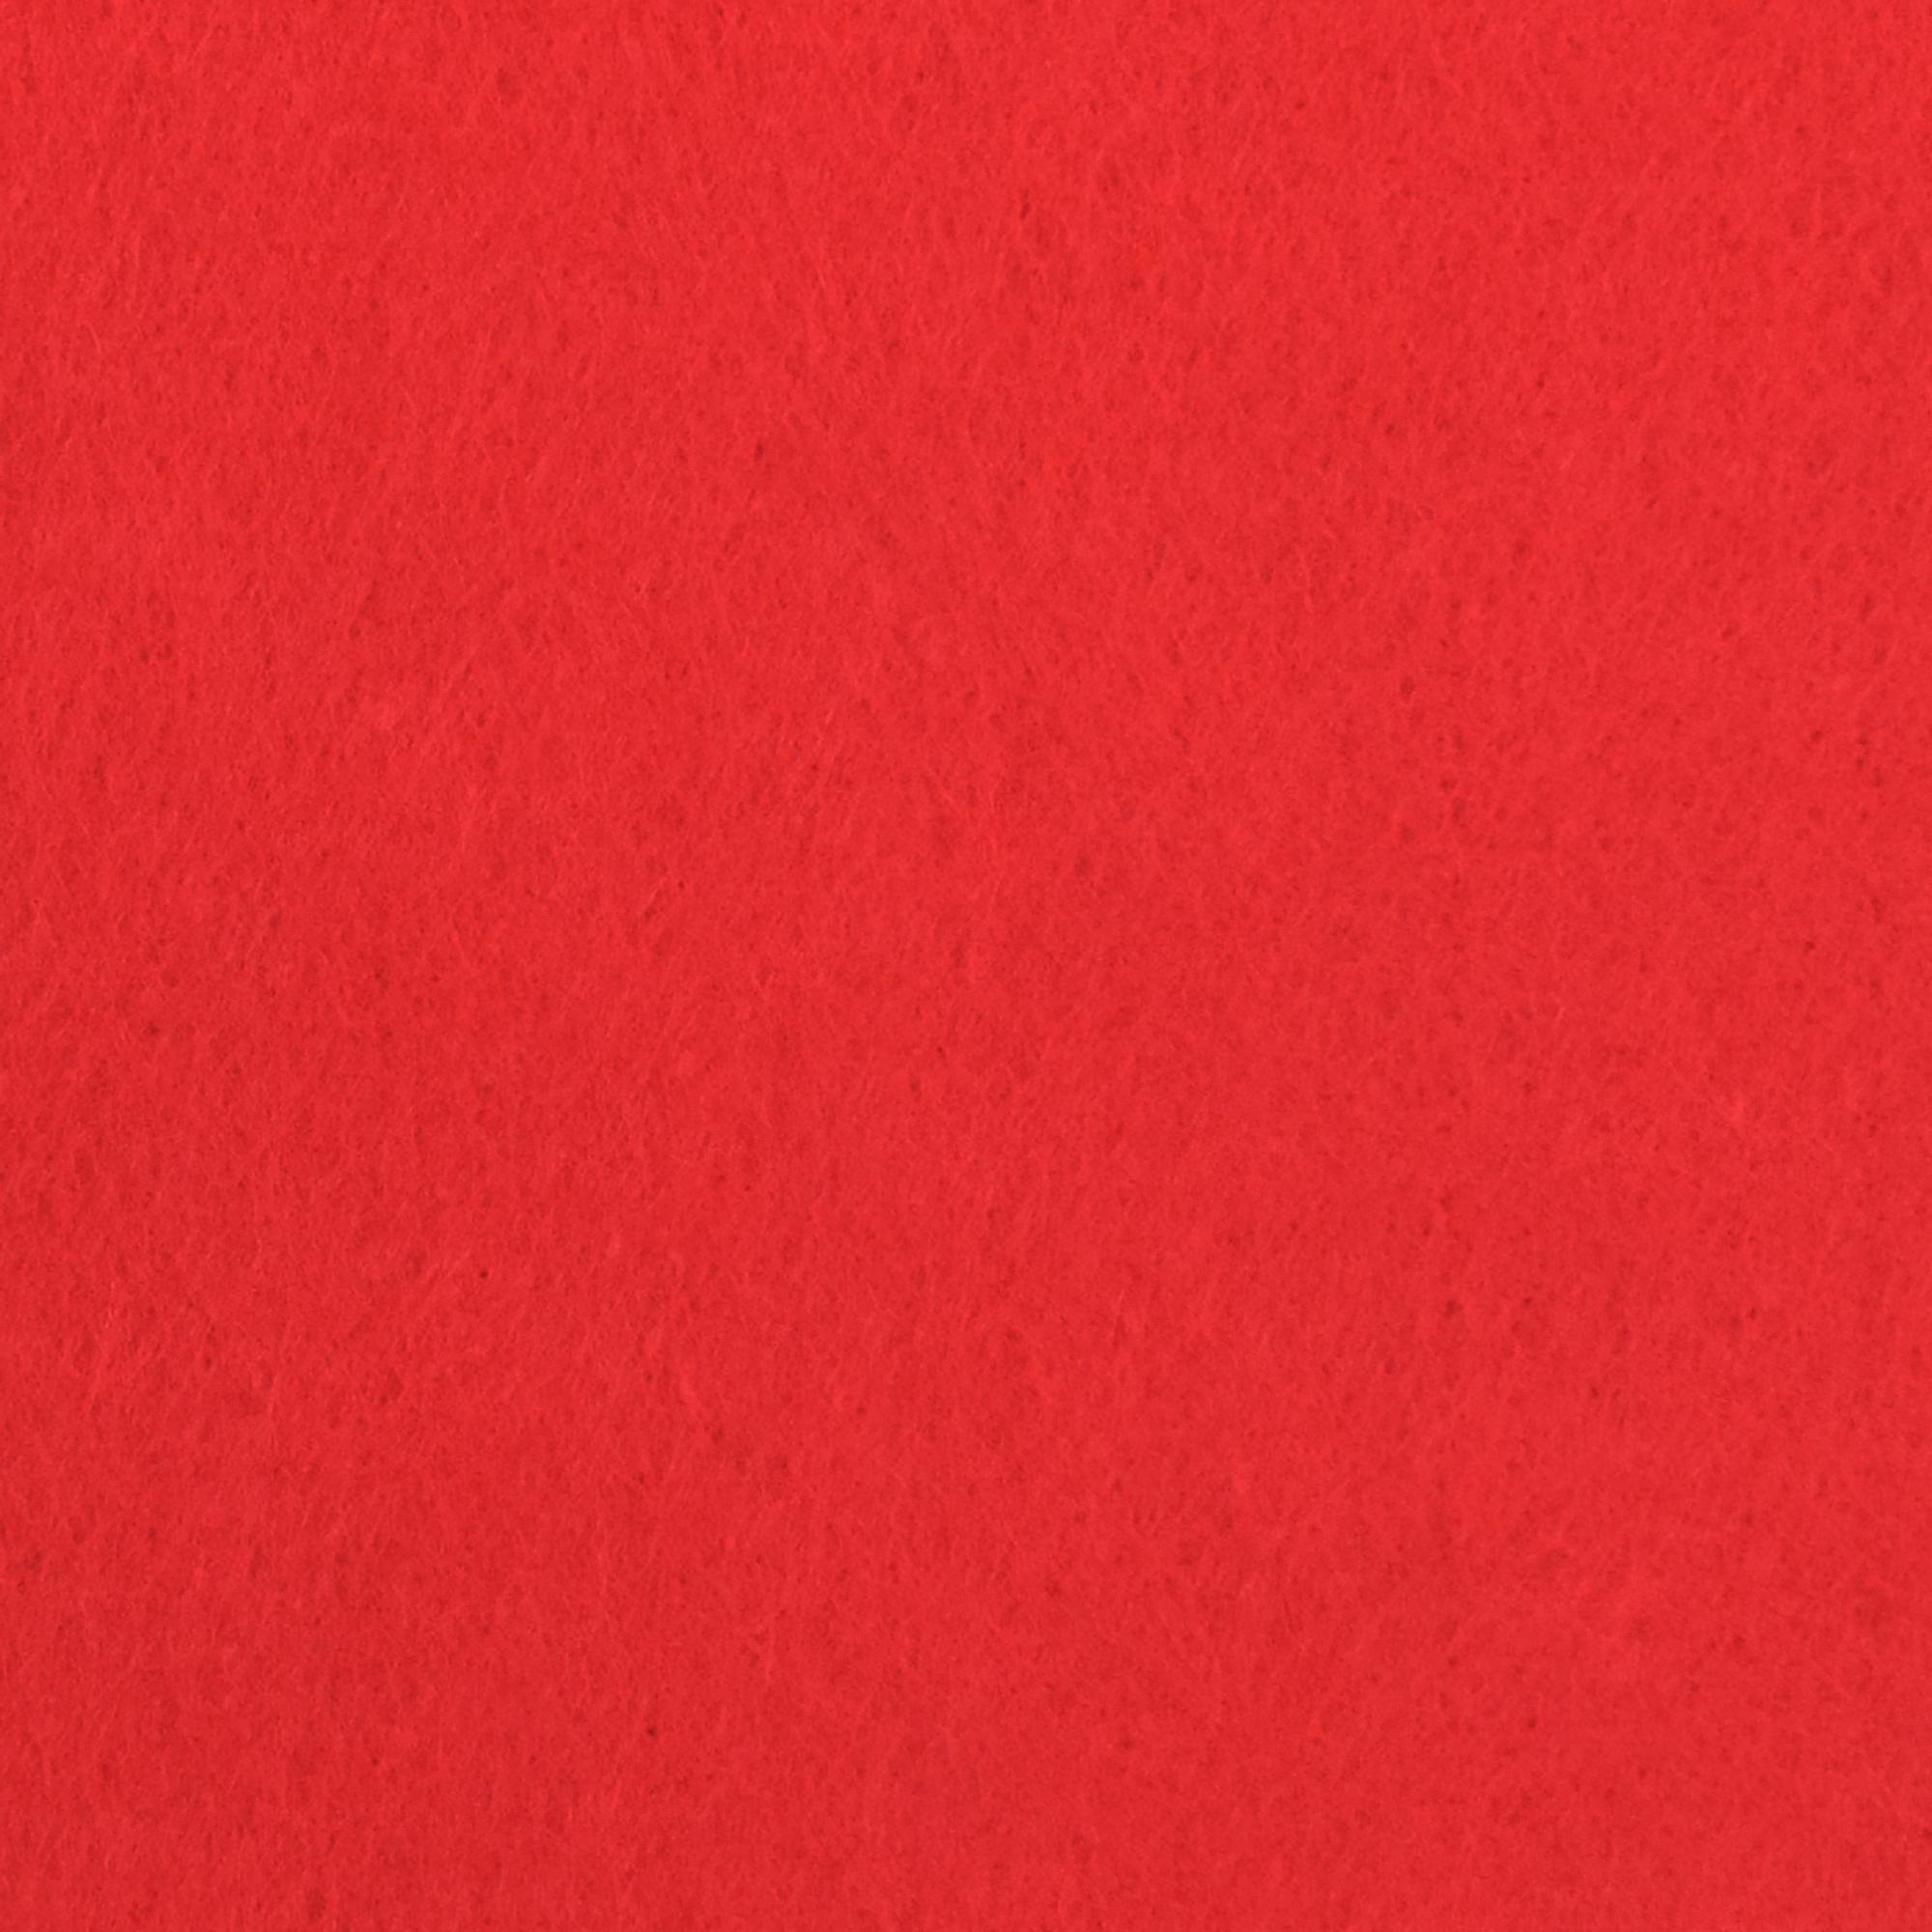 Roter Bastelfilz